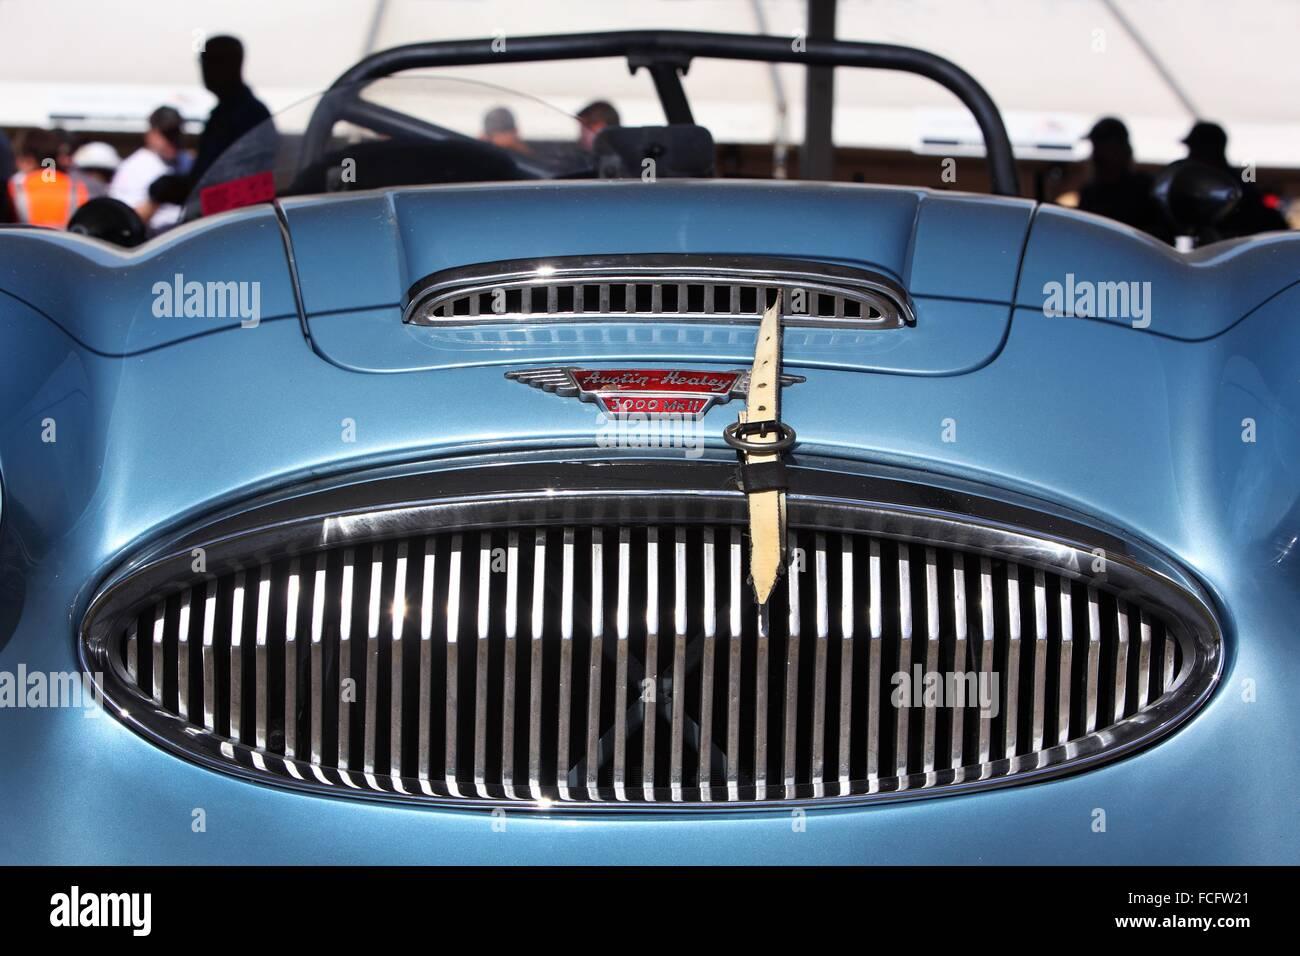 Detail of classic race car Austin Healy 3000 MkII. Melbourne, Australia. - Stock Image